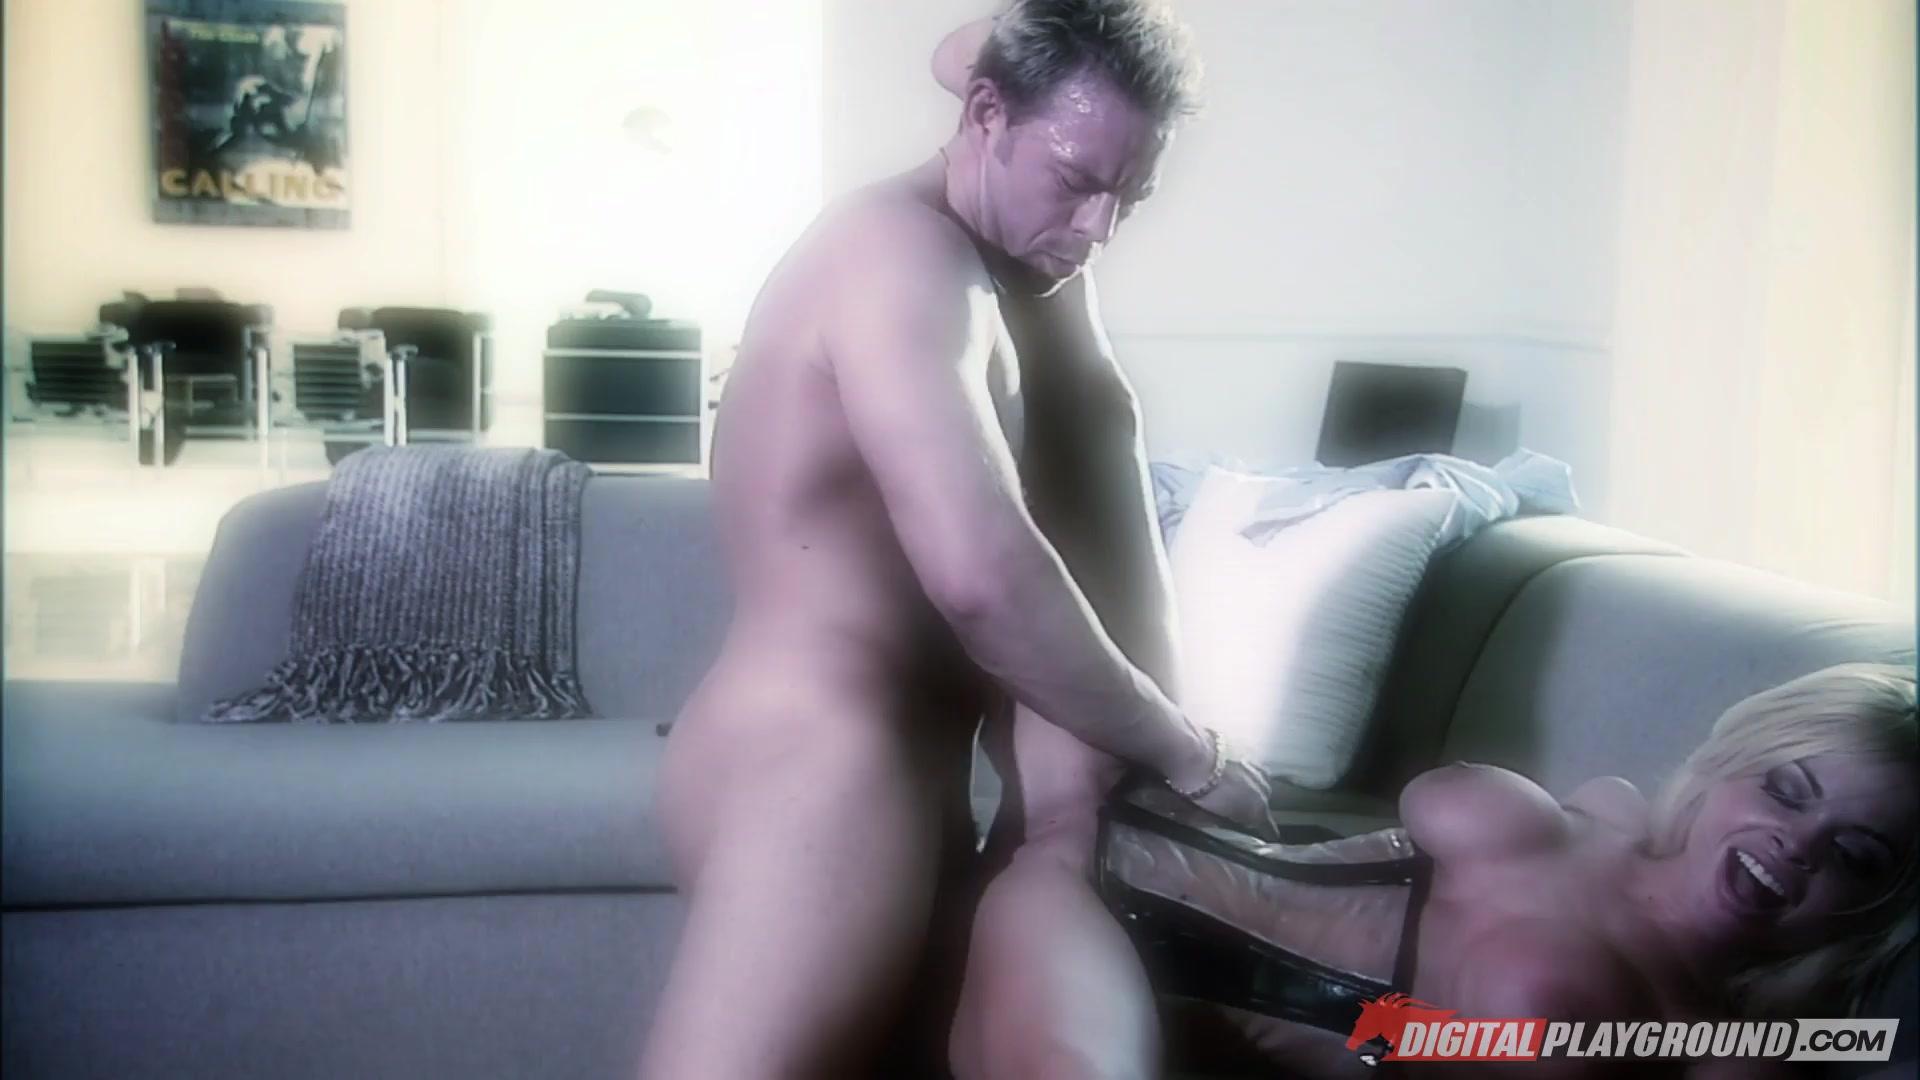 Candice machiel sex tape